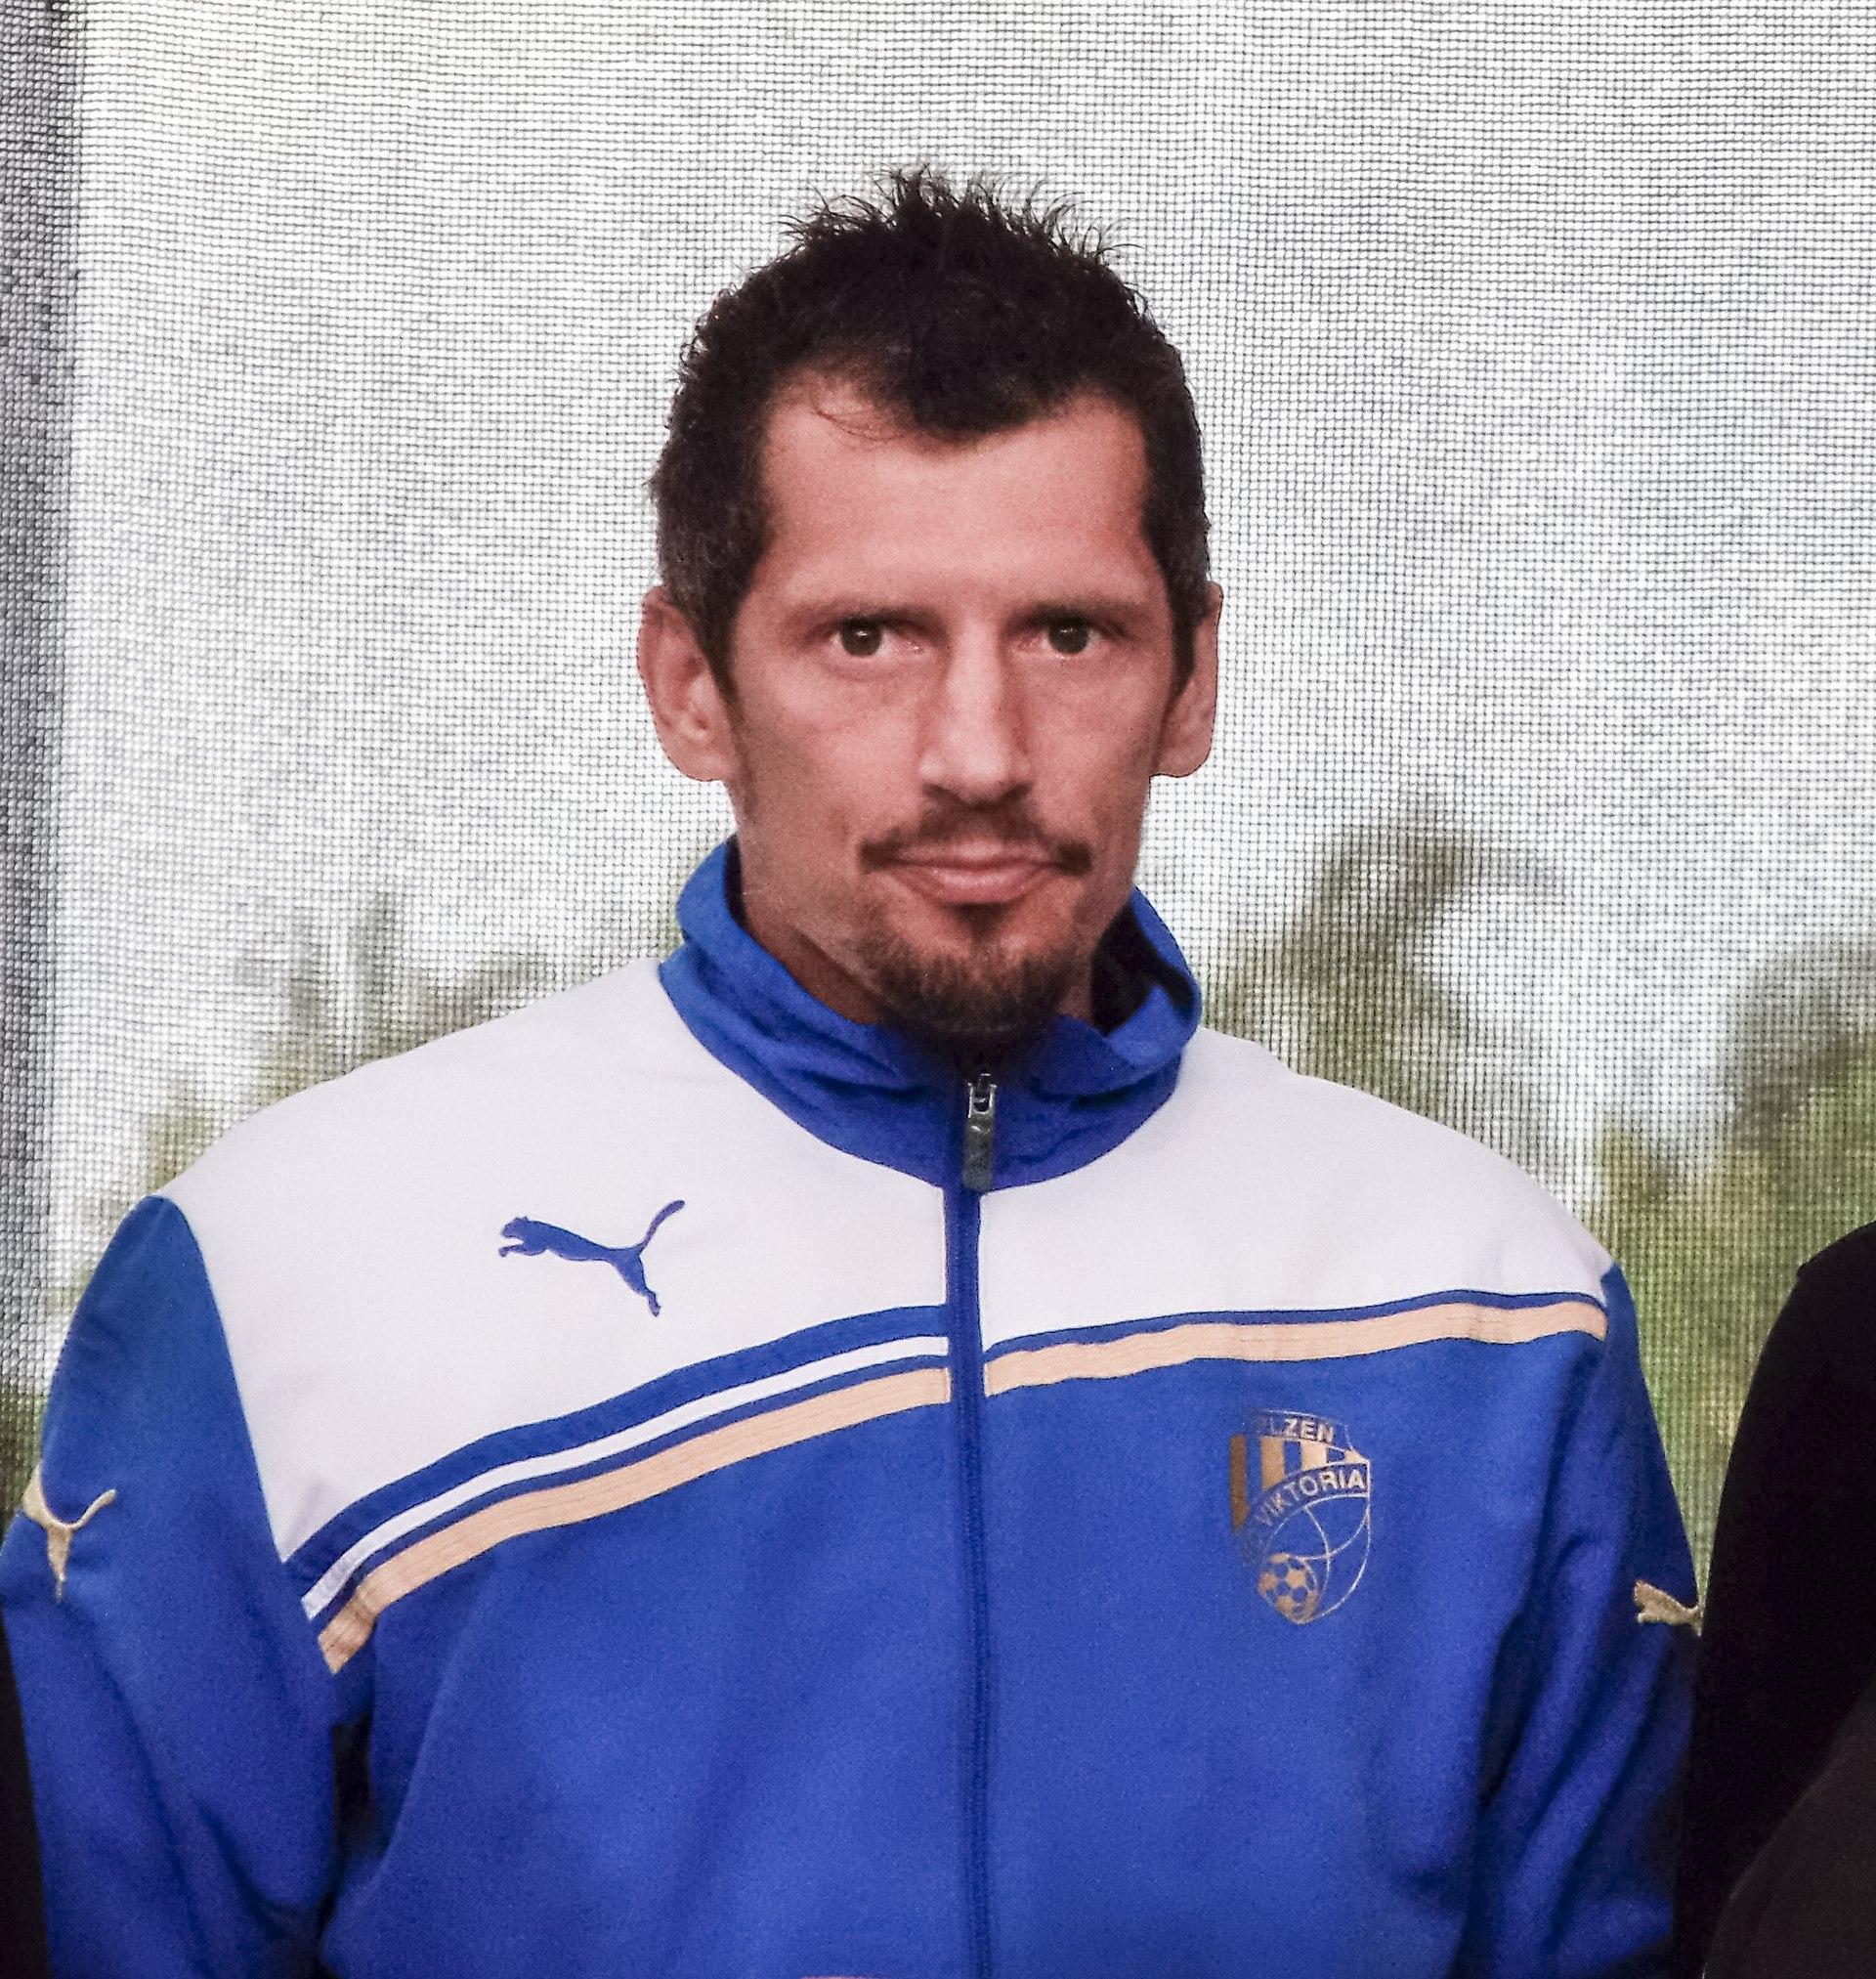 Marian Cisovsky - player profile - Transfermarkt  |Marian Cisovsky